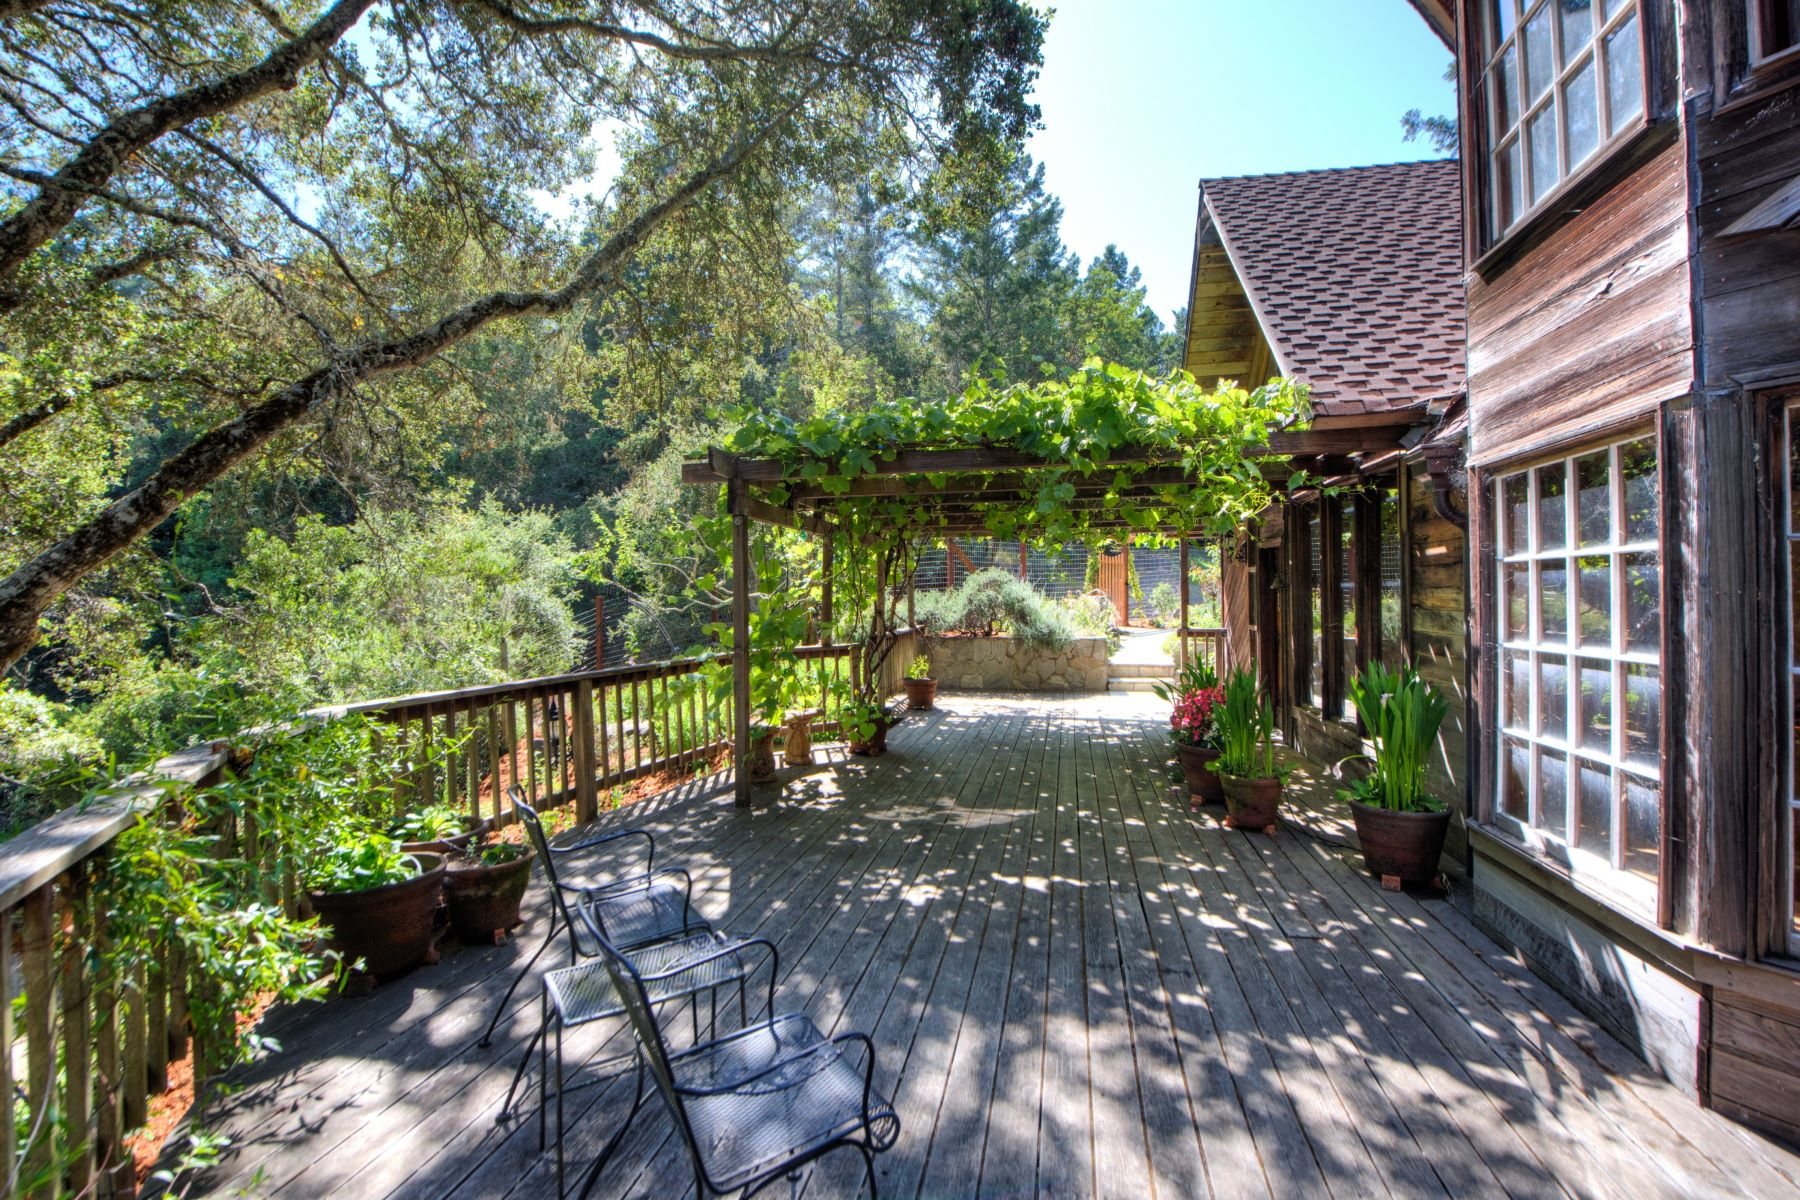 獨棟家庭住宅 為 出售 在 Enchanting Setting 1949 Nicasio Valley Road Nicasio, 加利福尼亞州, 94946 美國